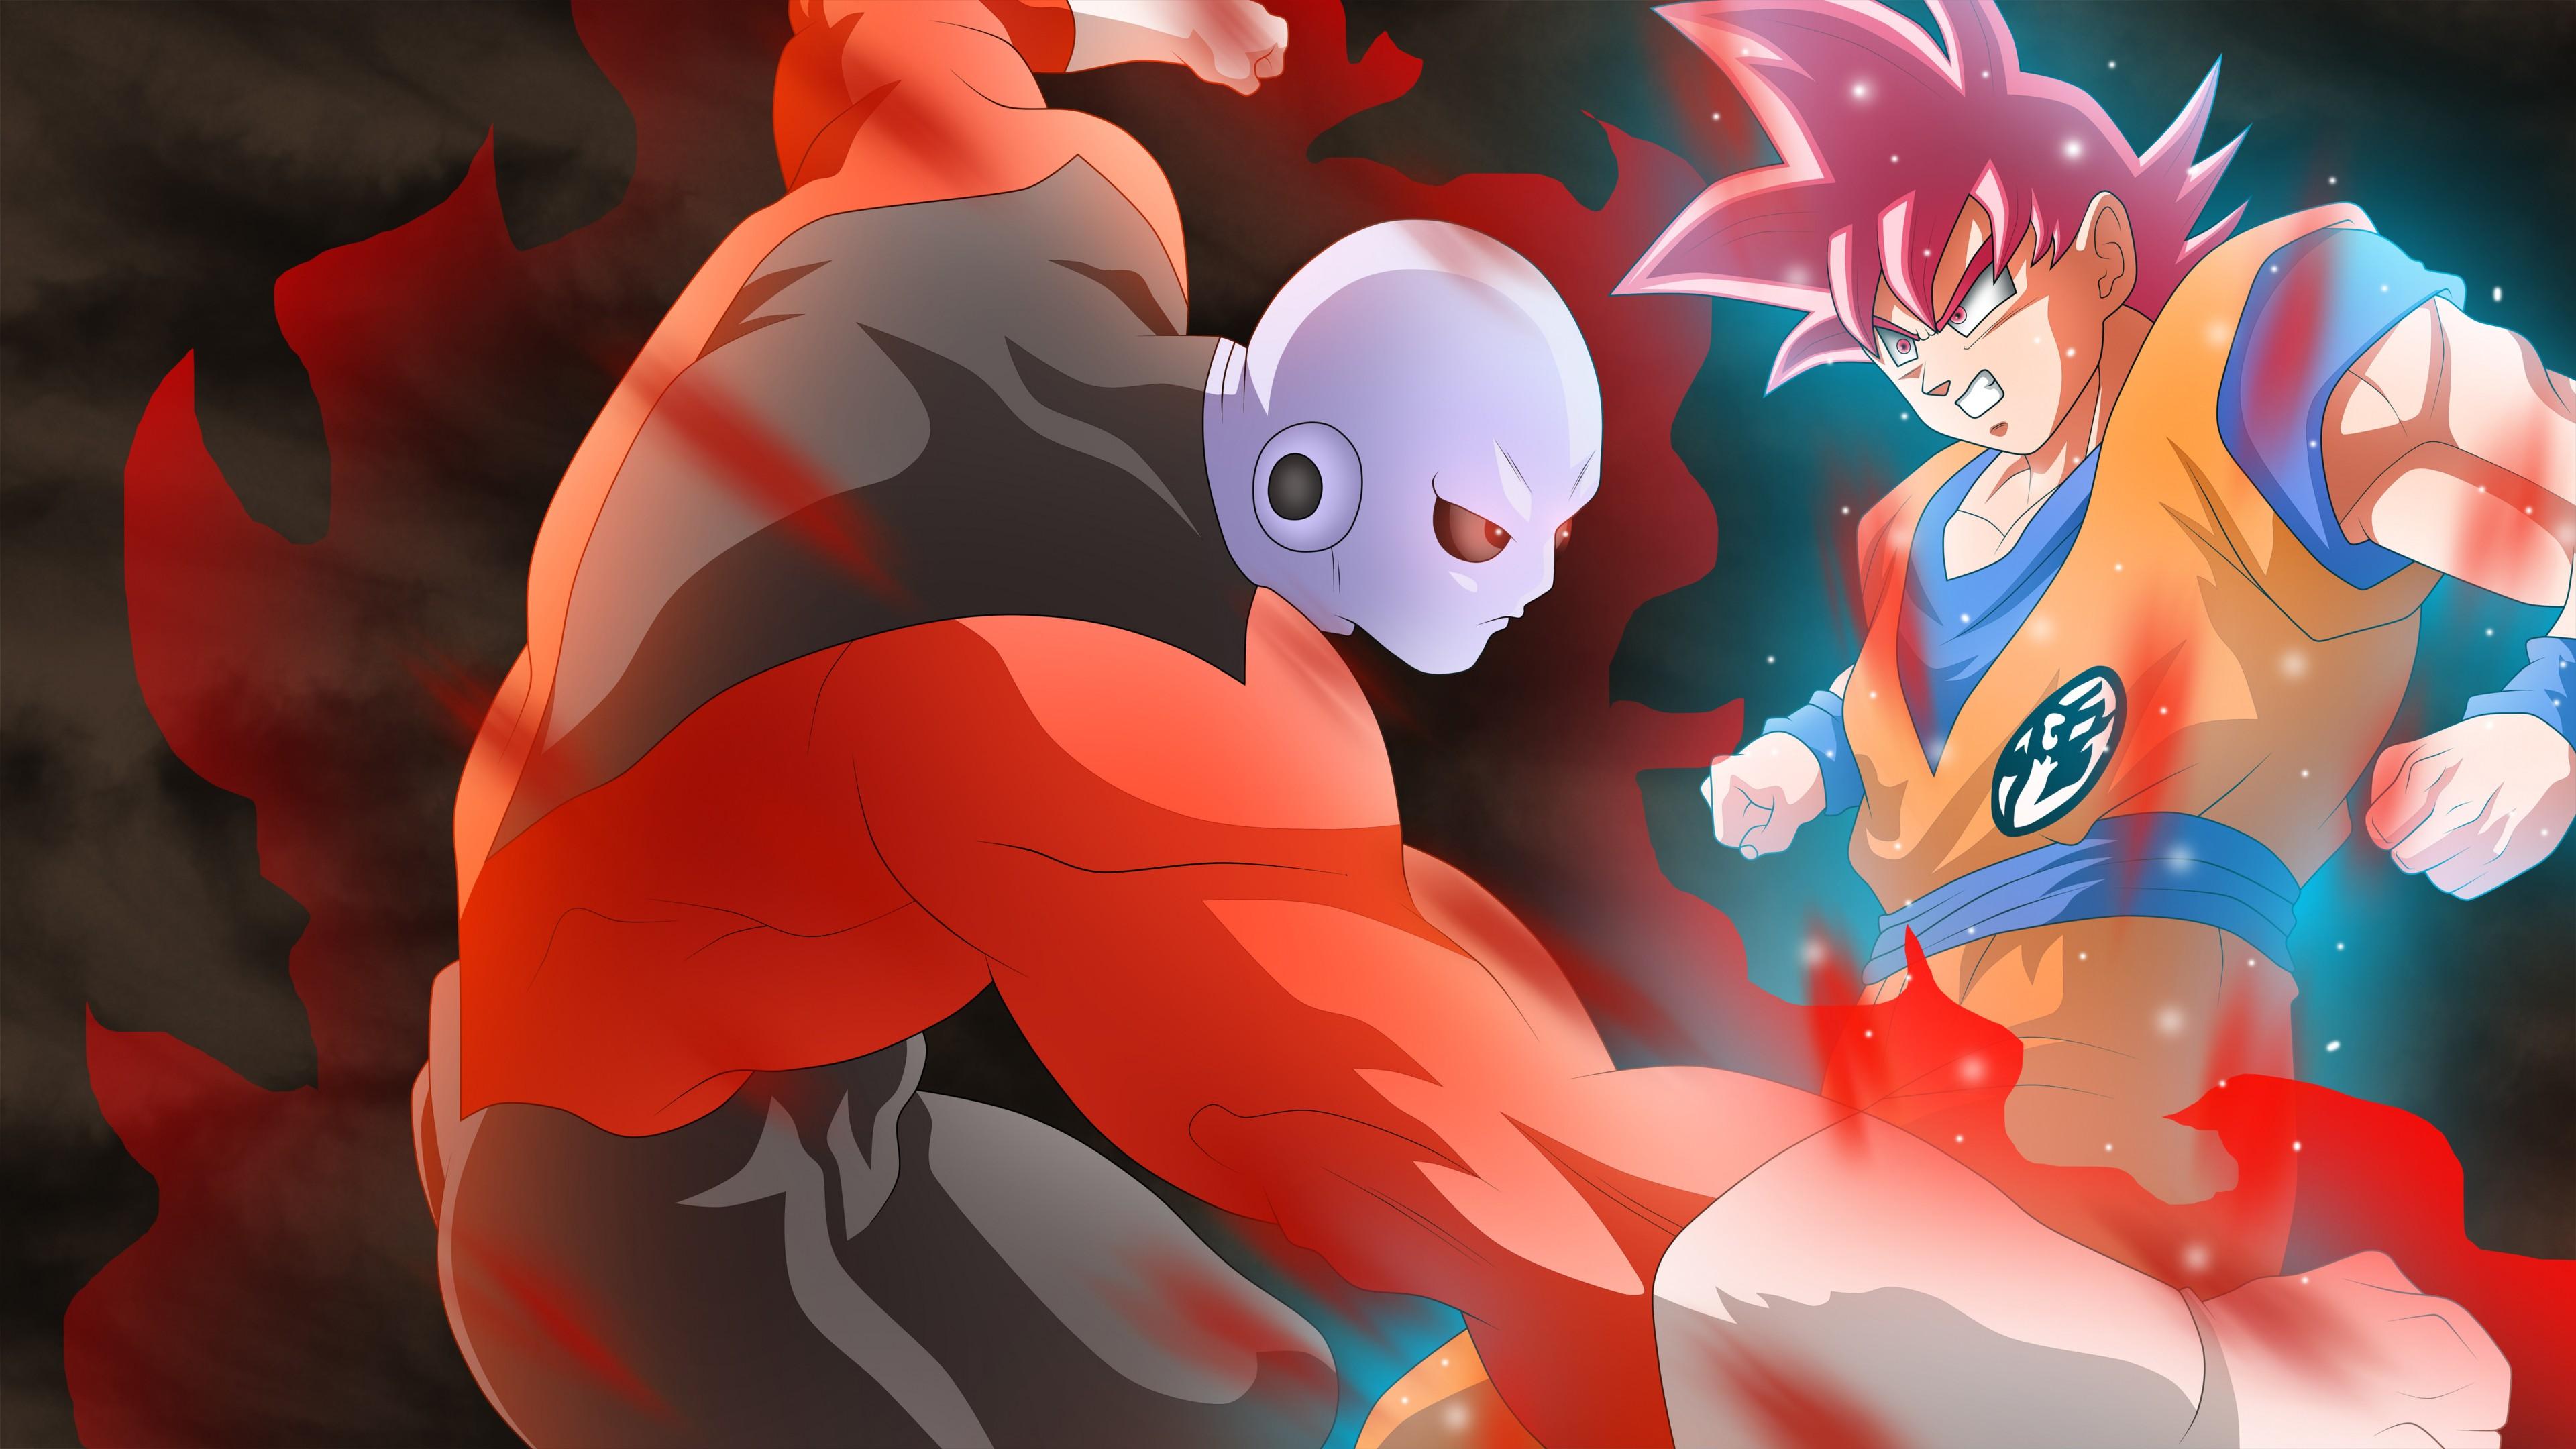 Iphone Vs Android Wallpaper Jiren Vs Goku Dragon Ball Super Wallpapers Hd Wallpapers